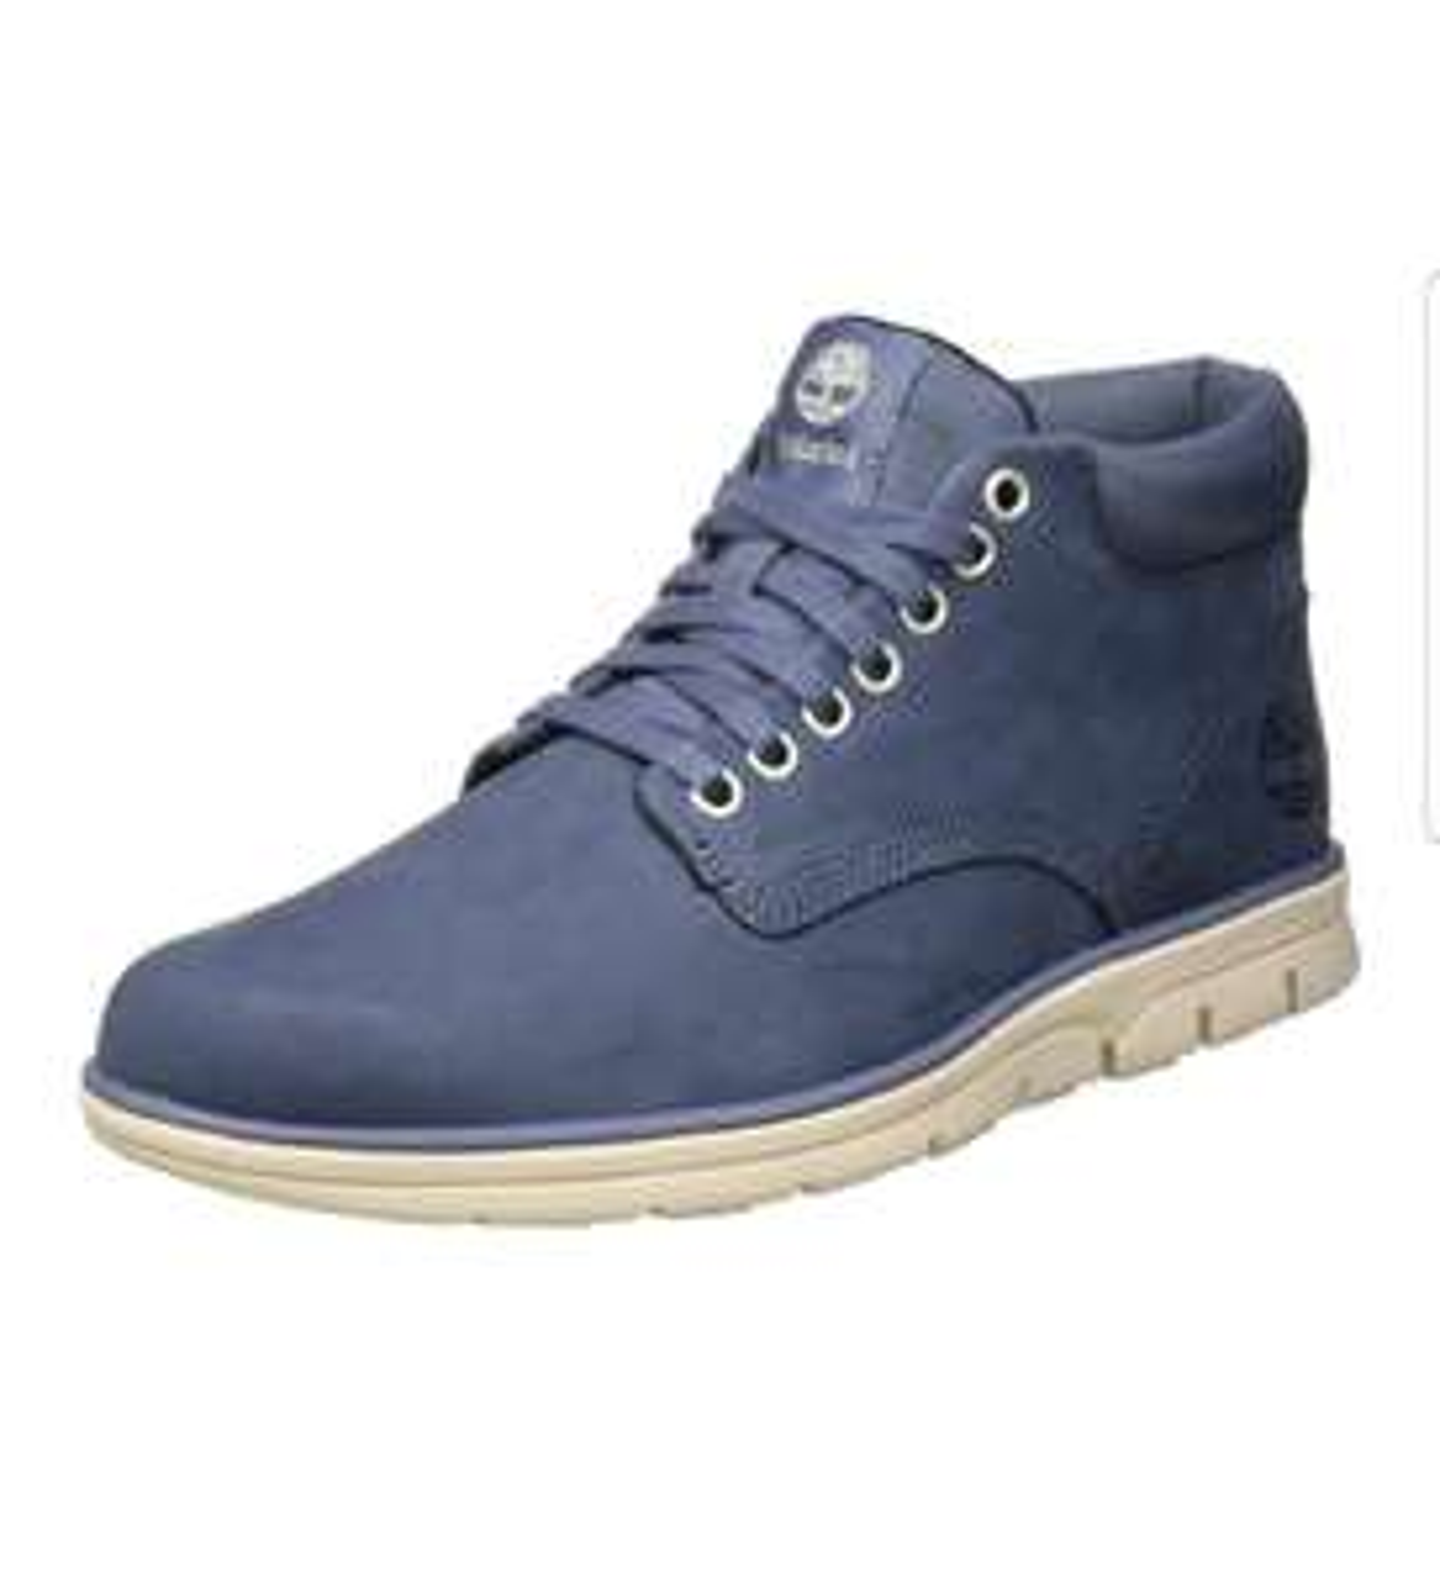 Chaussures Chukka Timberland Bradstreet Leather - Bleu (taille 41.5)